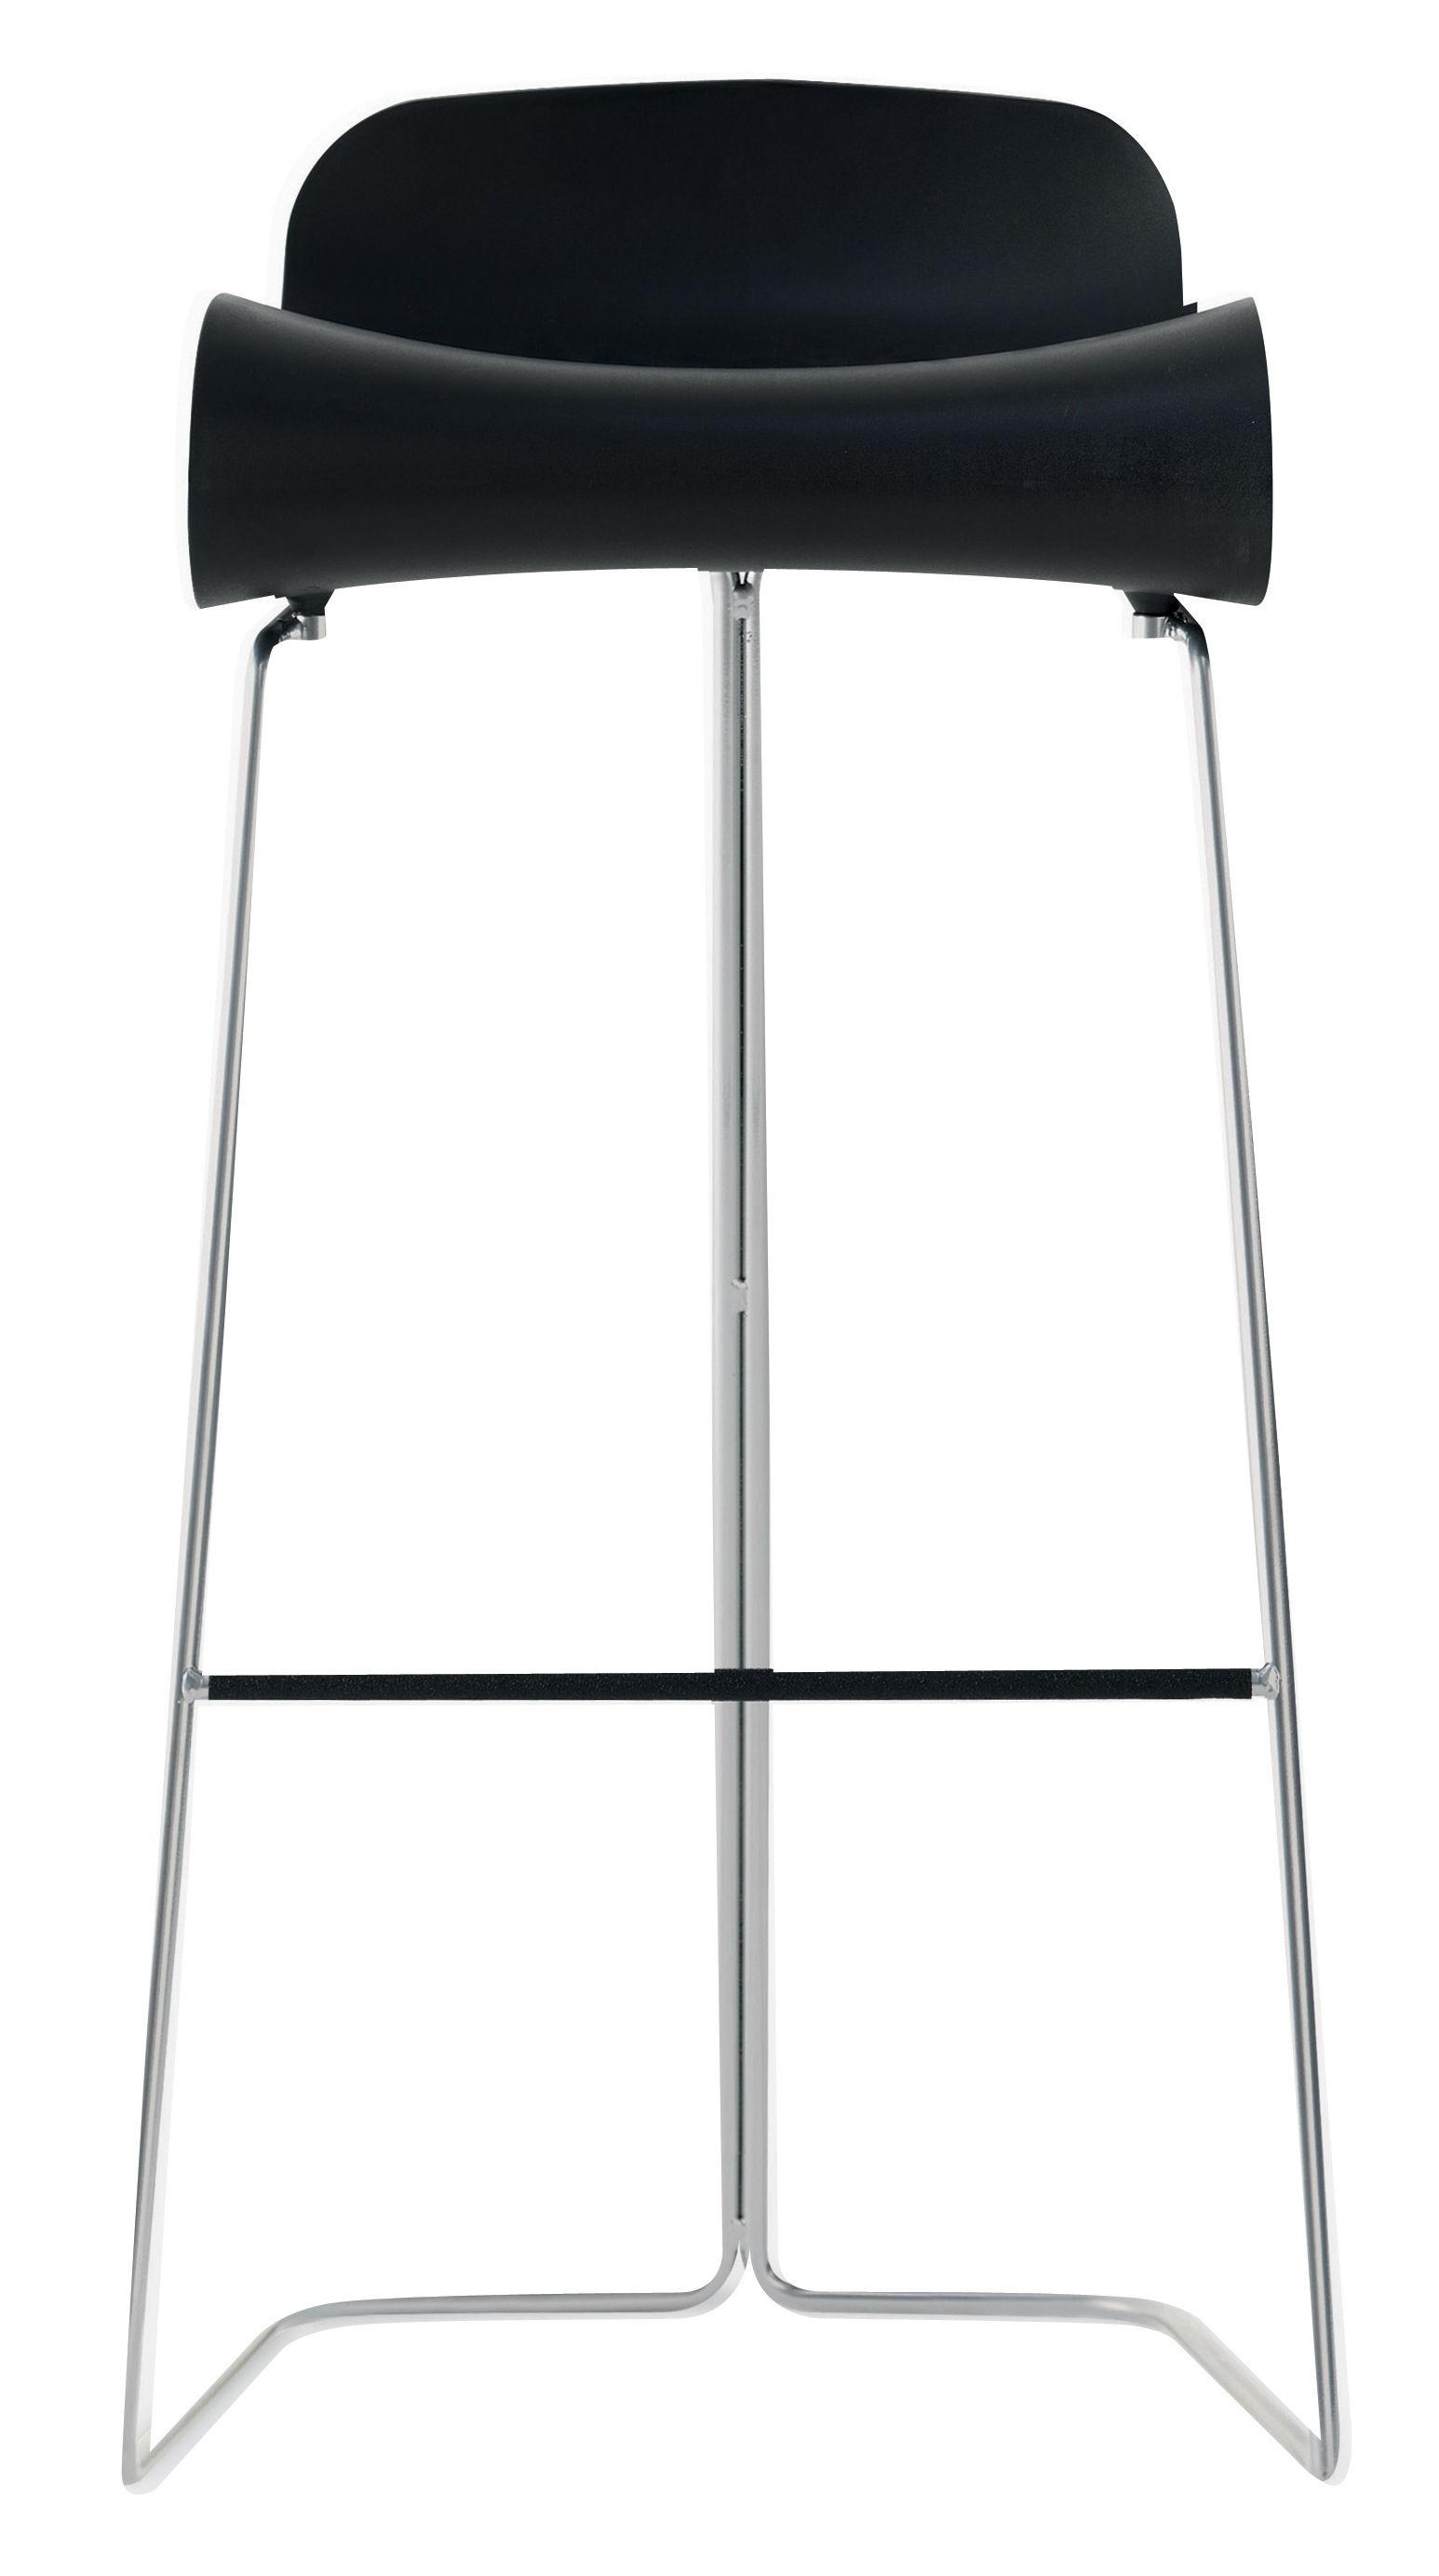 Furniture - Bar Stools - BCN Bar stool - H 76 cm by Kristalia - Black - PBT plastic, Varnished steel